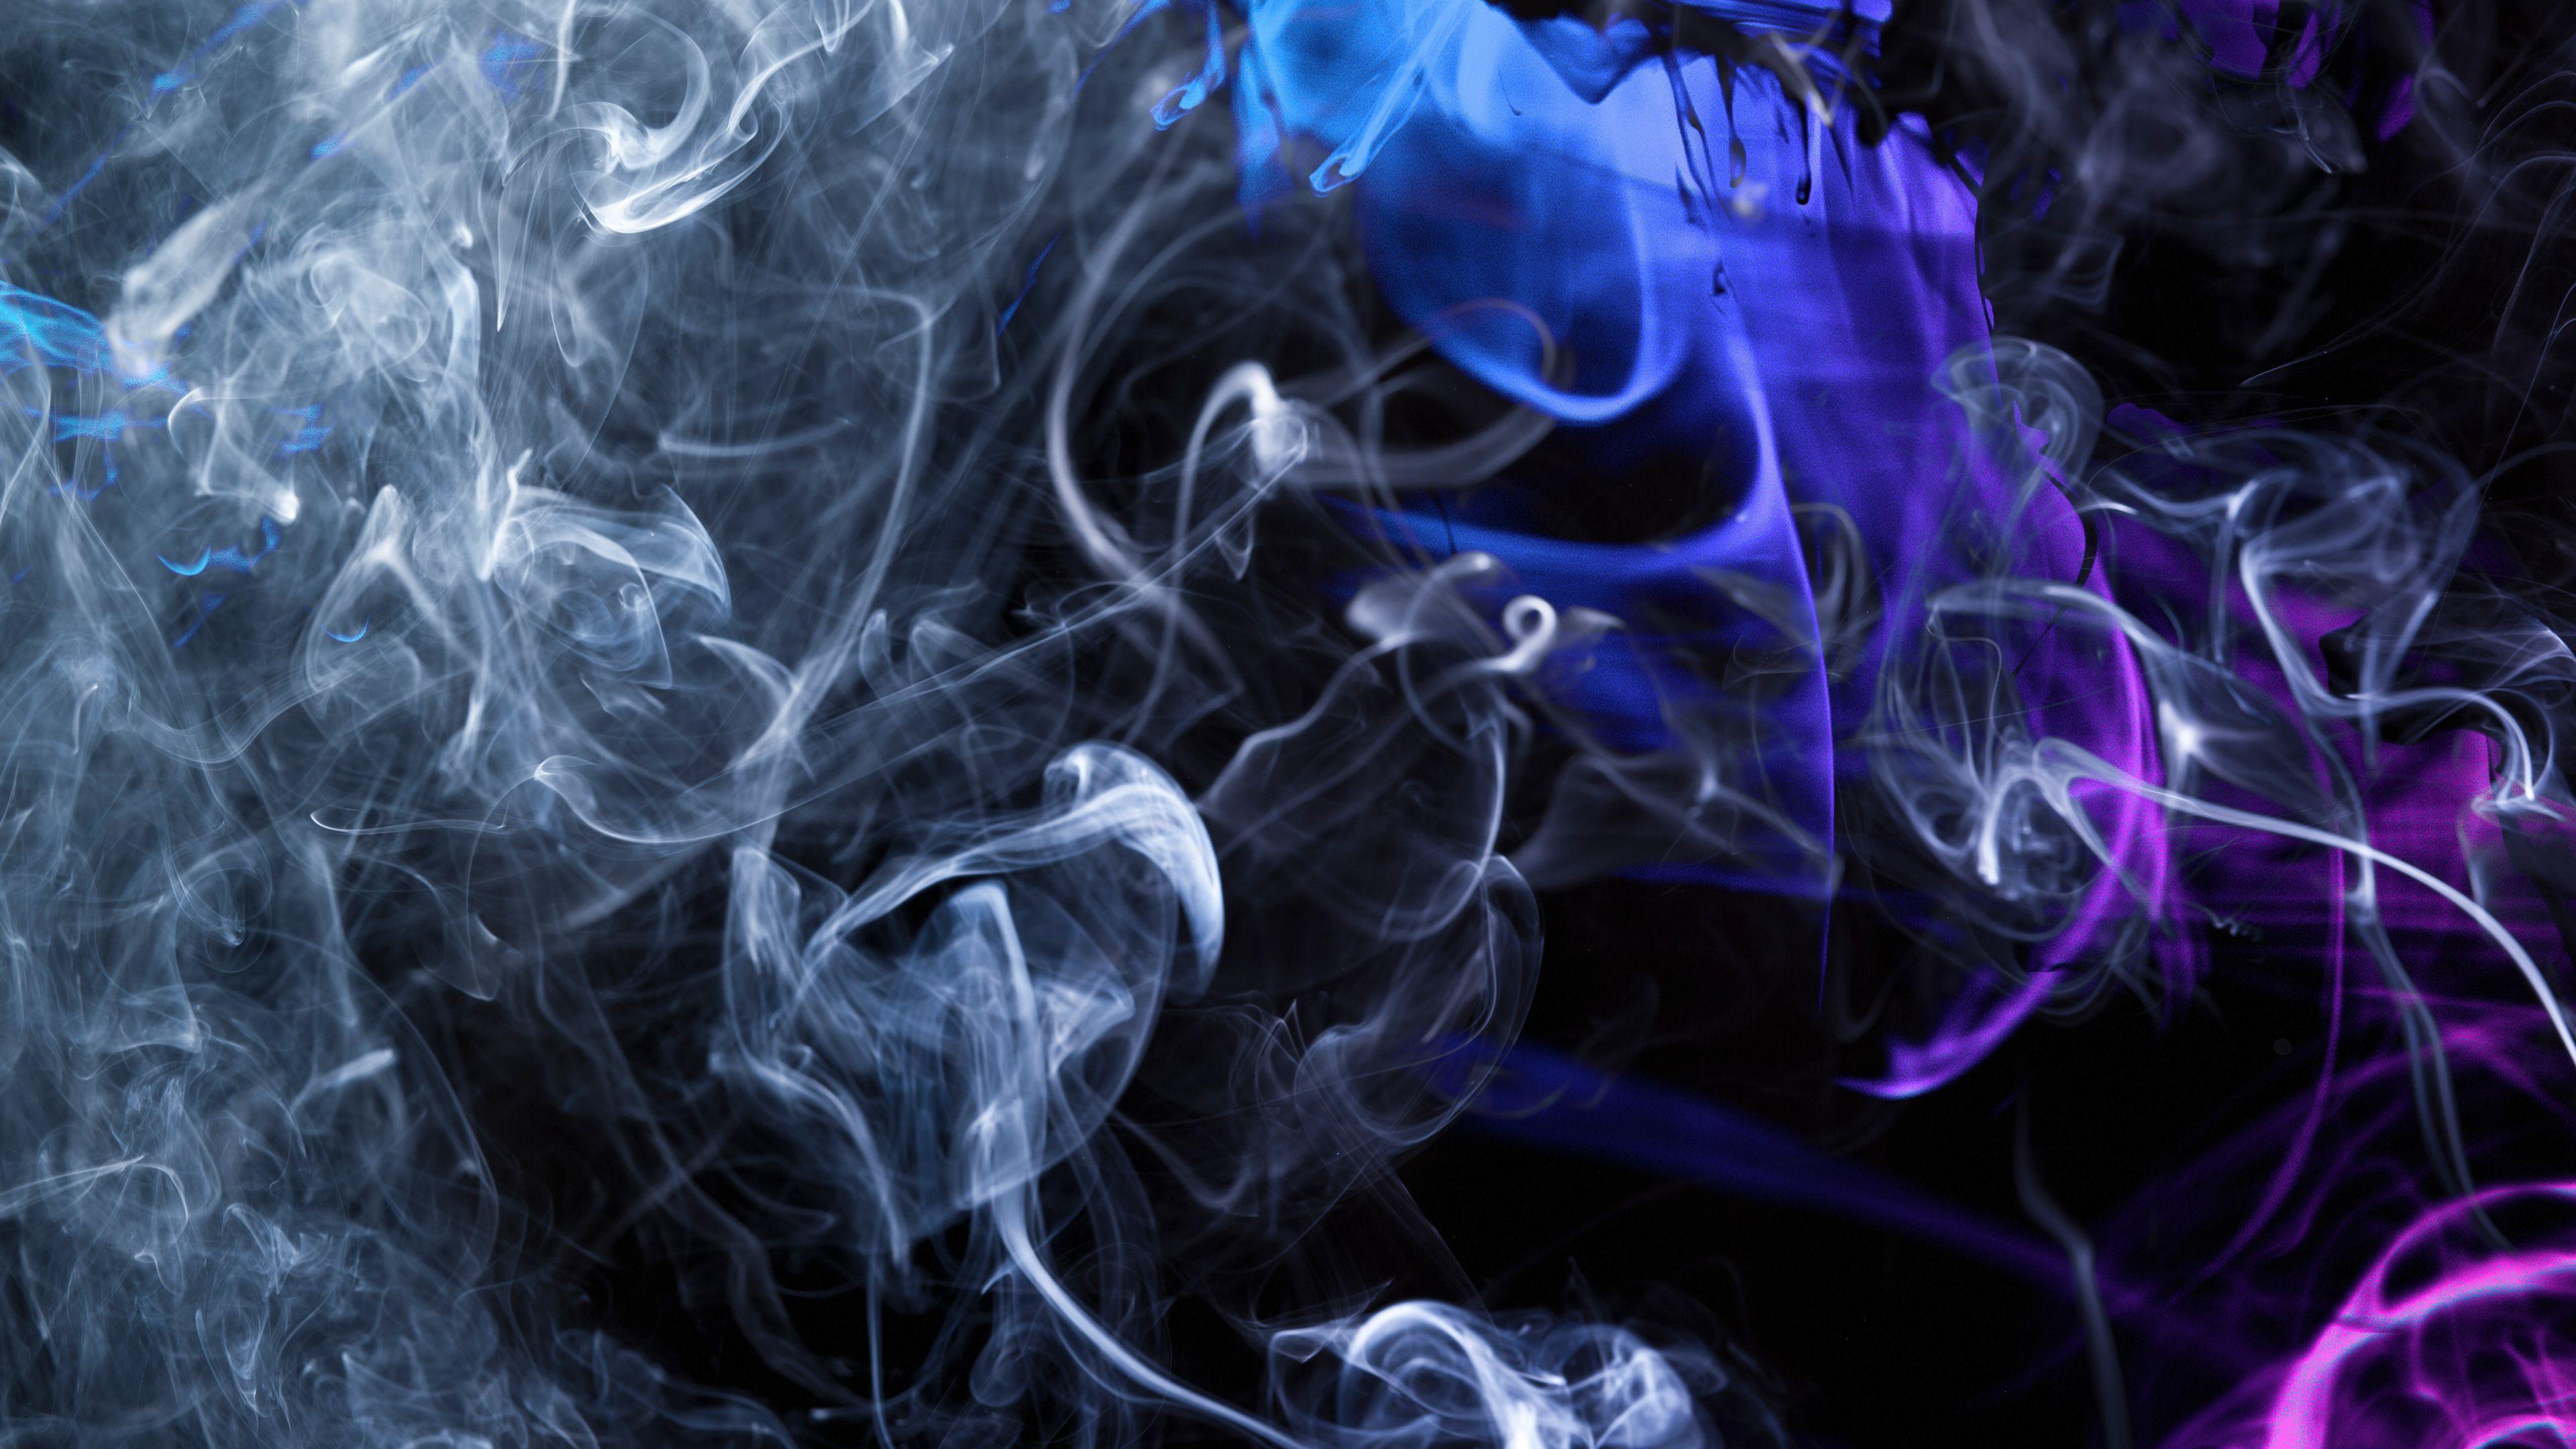 Abstract Smoke Wallpapers - Top Free Abstract Smoke ...